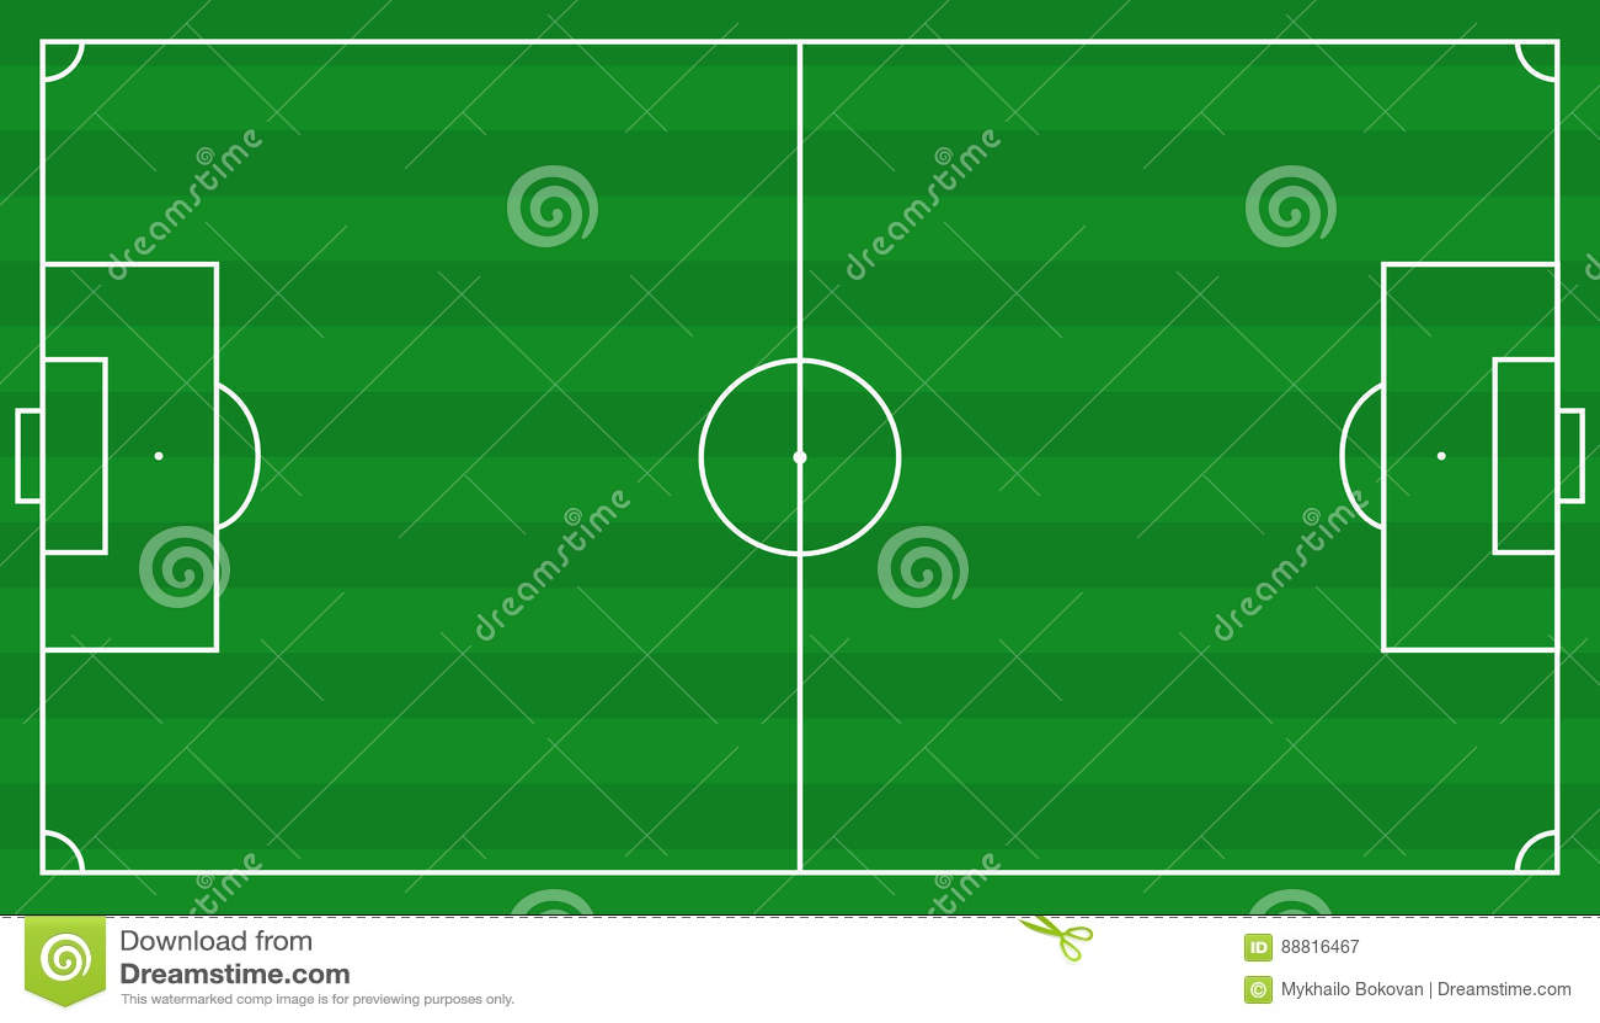 Plan de terrain de football illustration de vecteur for Plan terrain